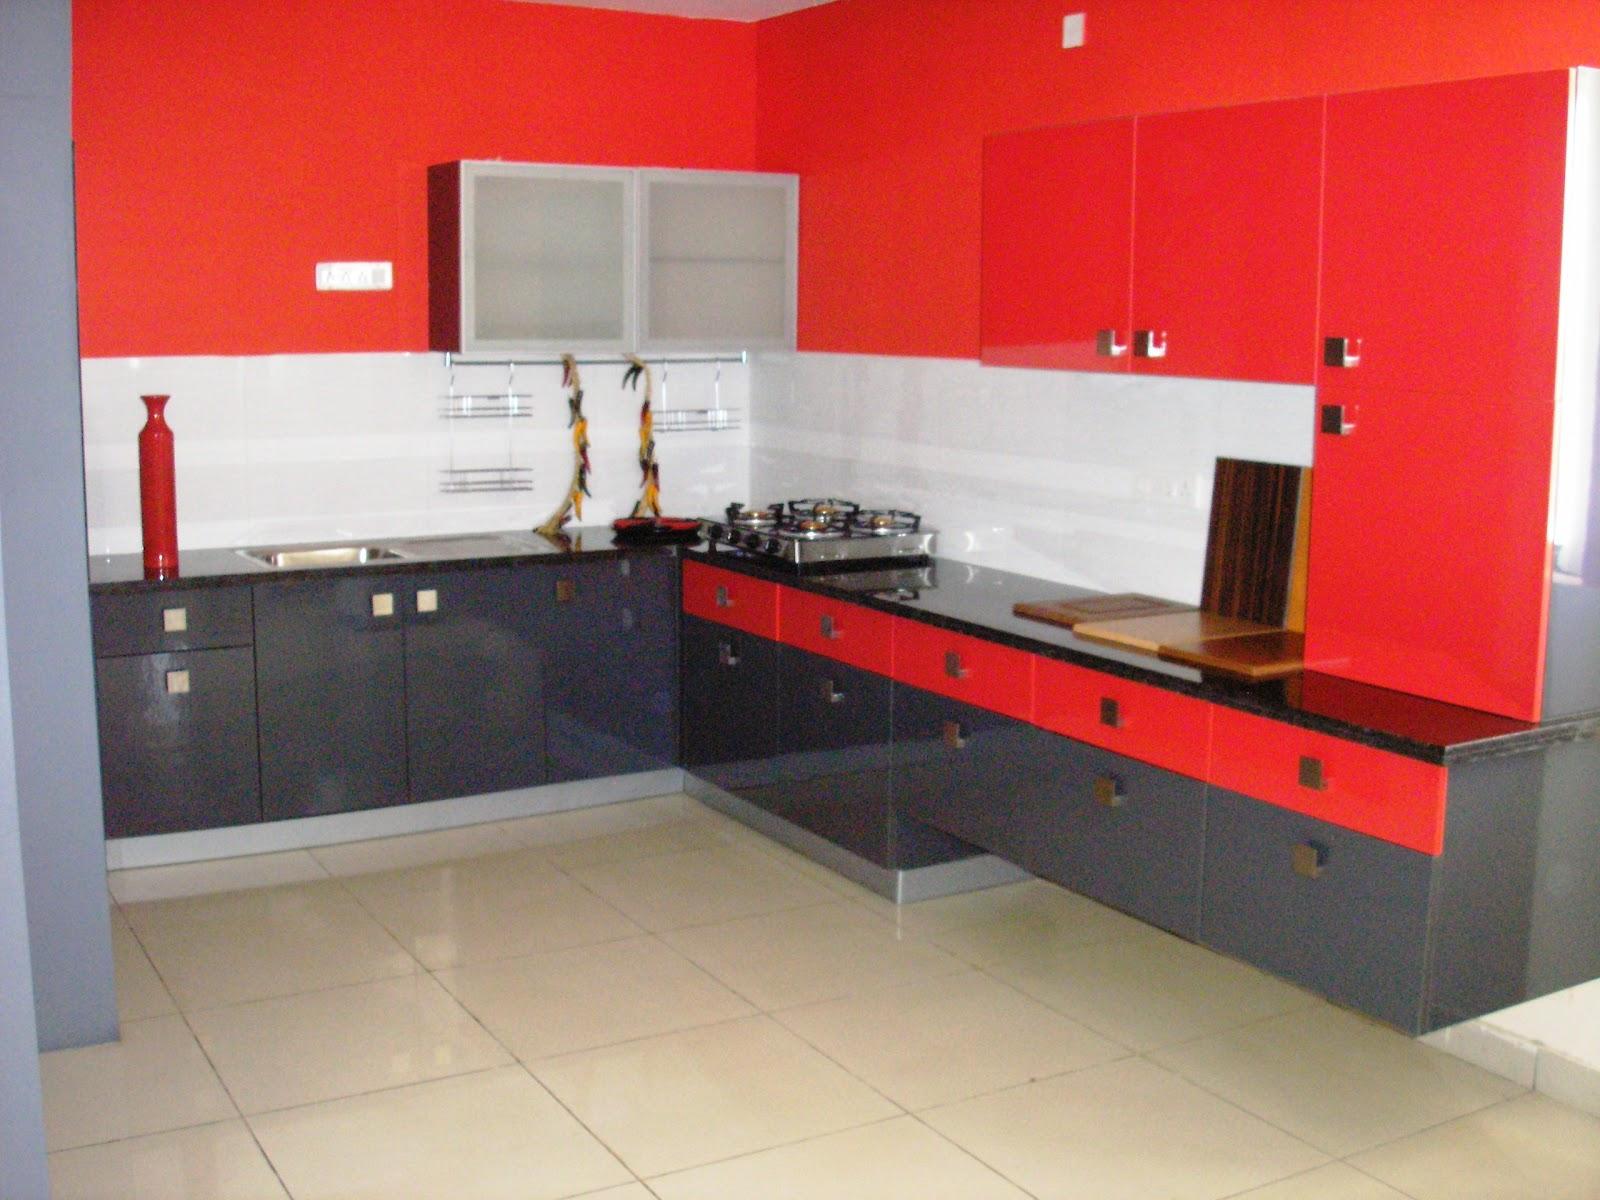 Elegant Red Kitchen Ideas (View 9 of 10)